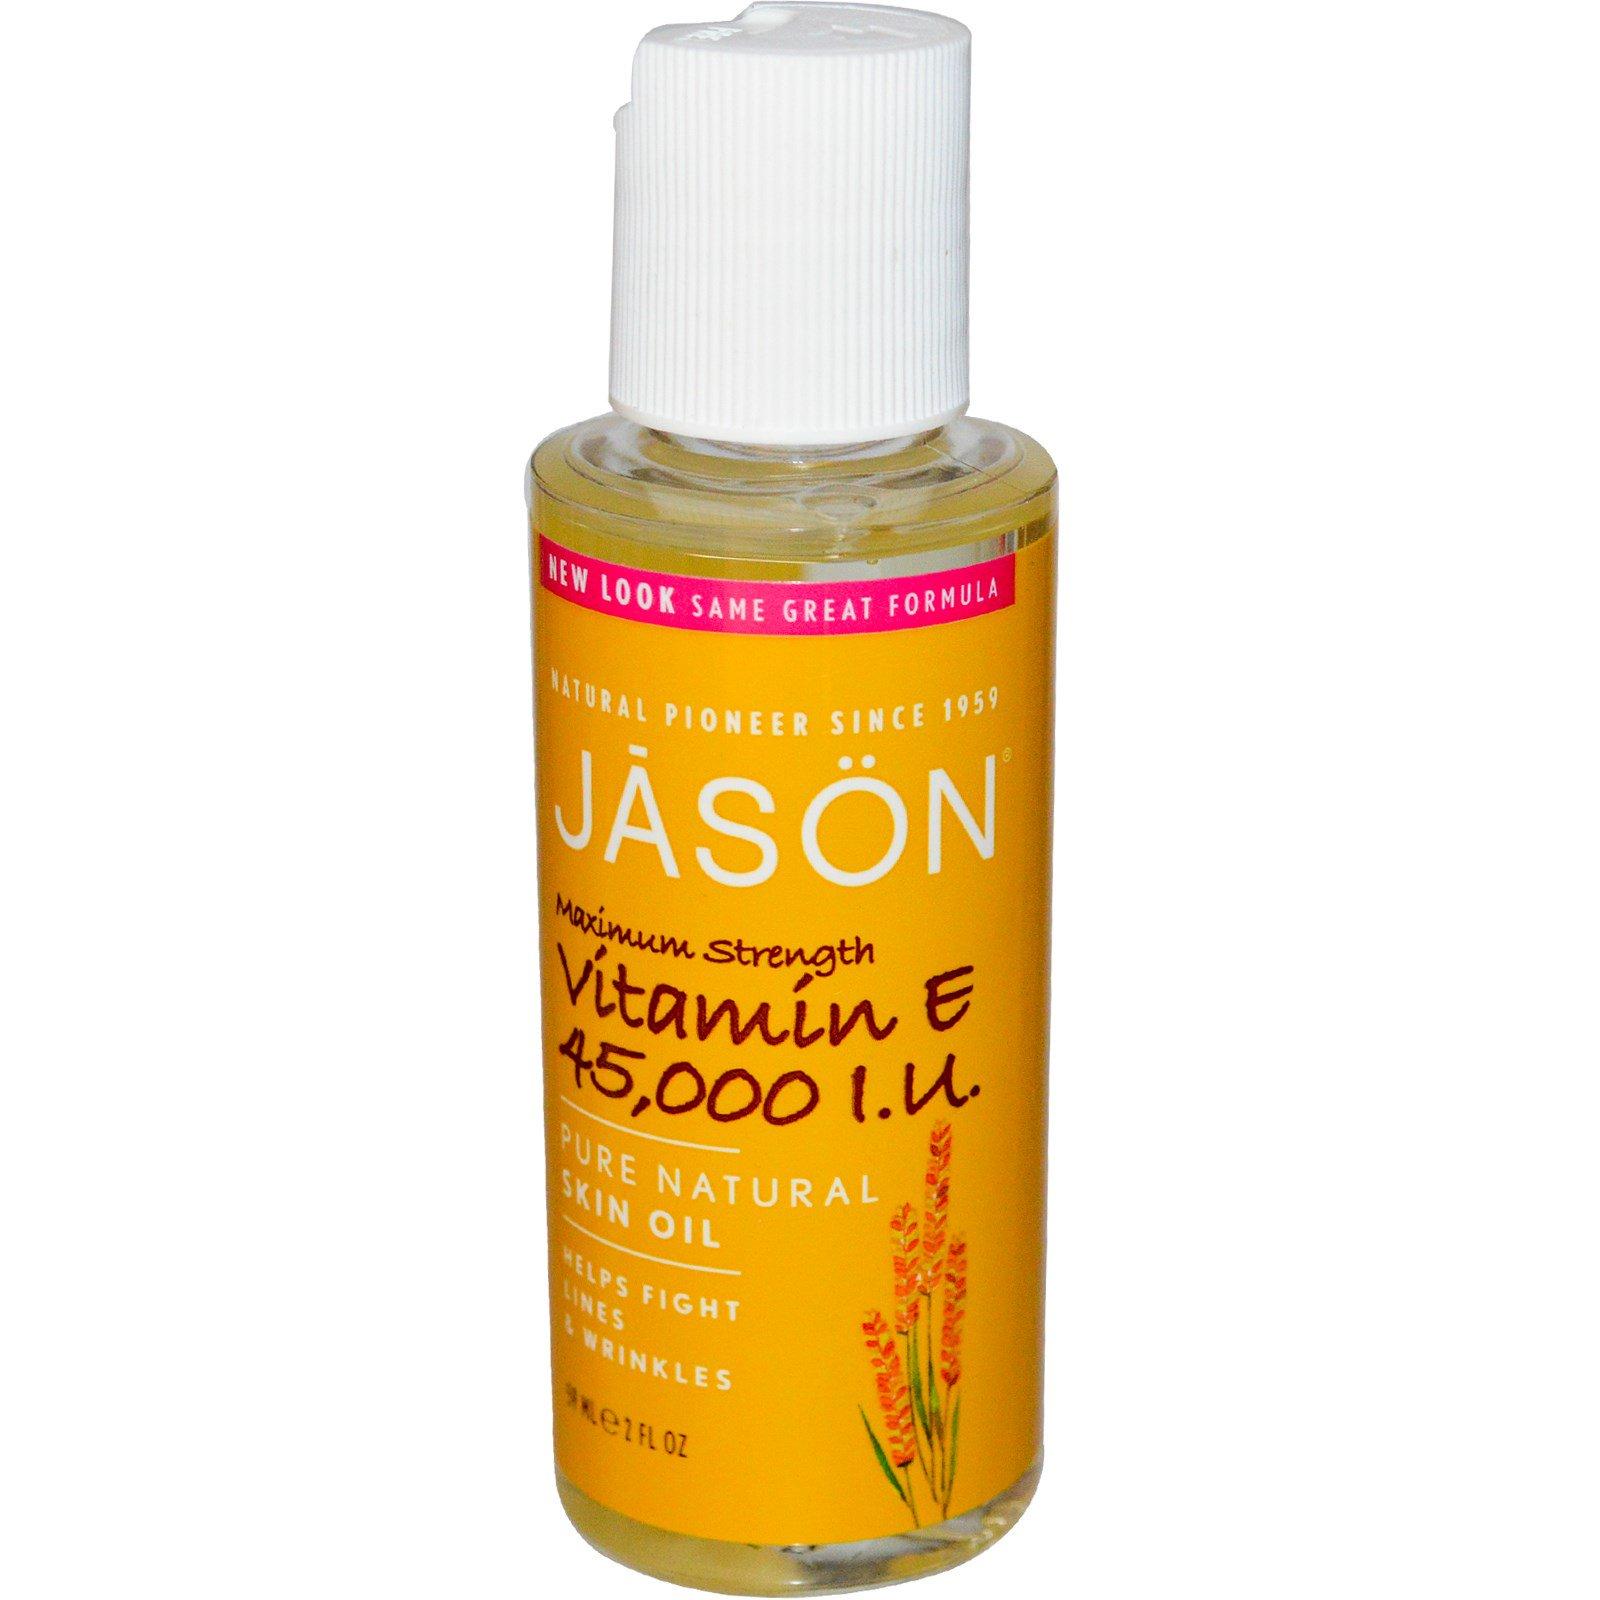 Jason Vitamin E Beauty 14,000 IU Skin Oil 1 oz (Pack of 2) Tinsel Eye Lashes